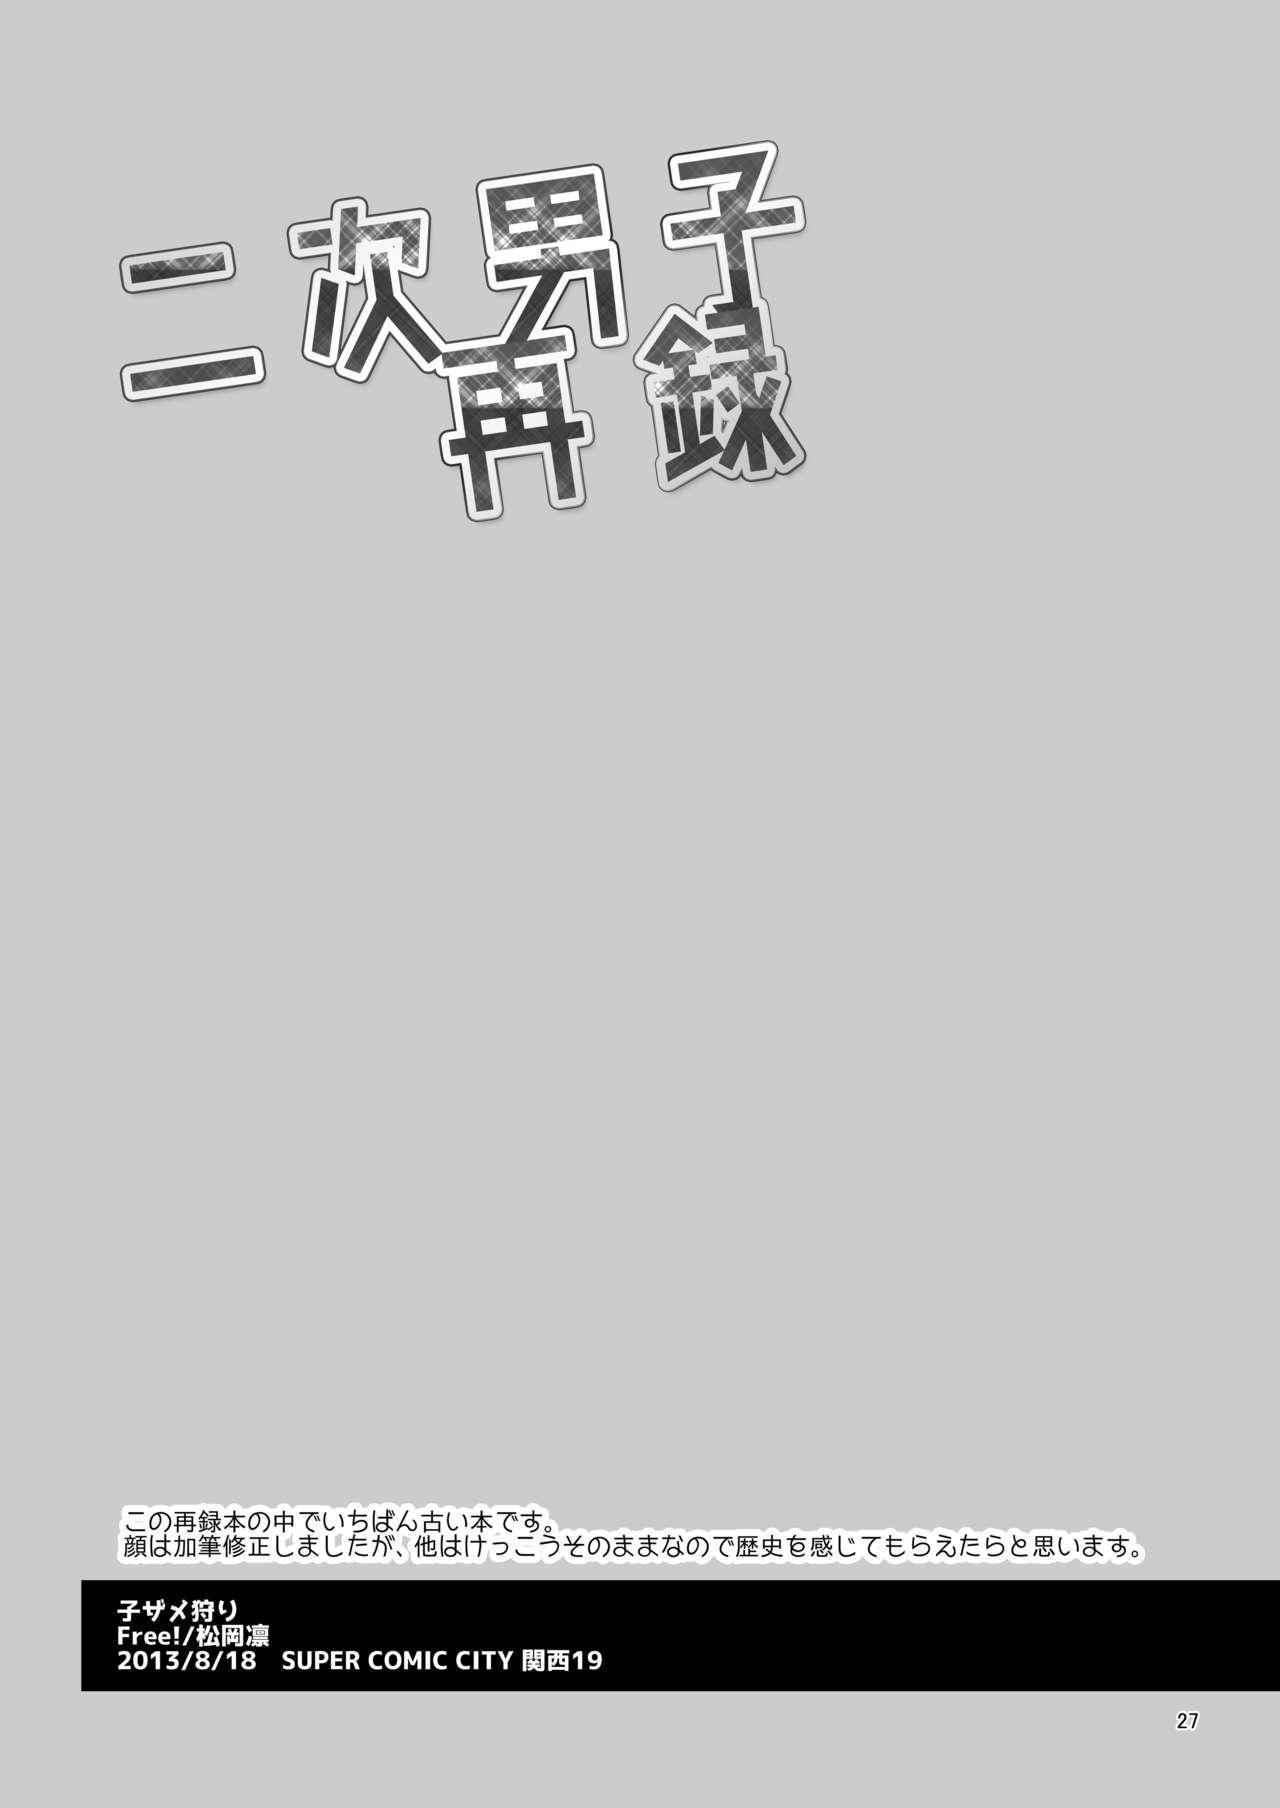 Niji Danshi Rerelease 27